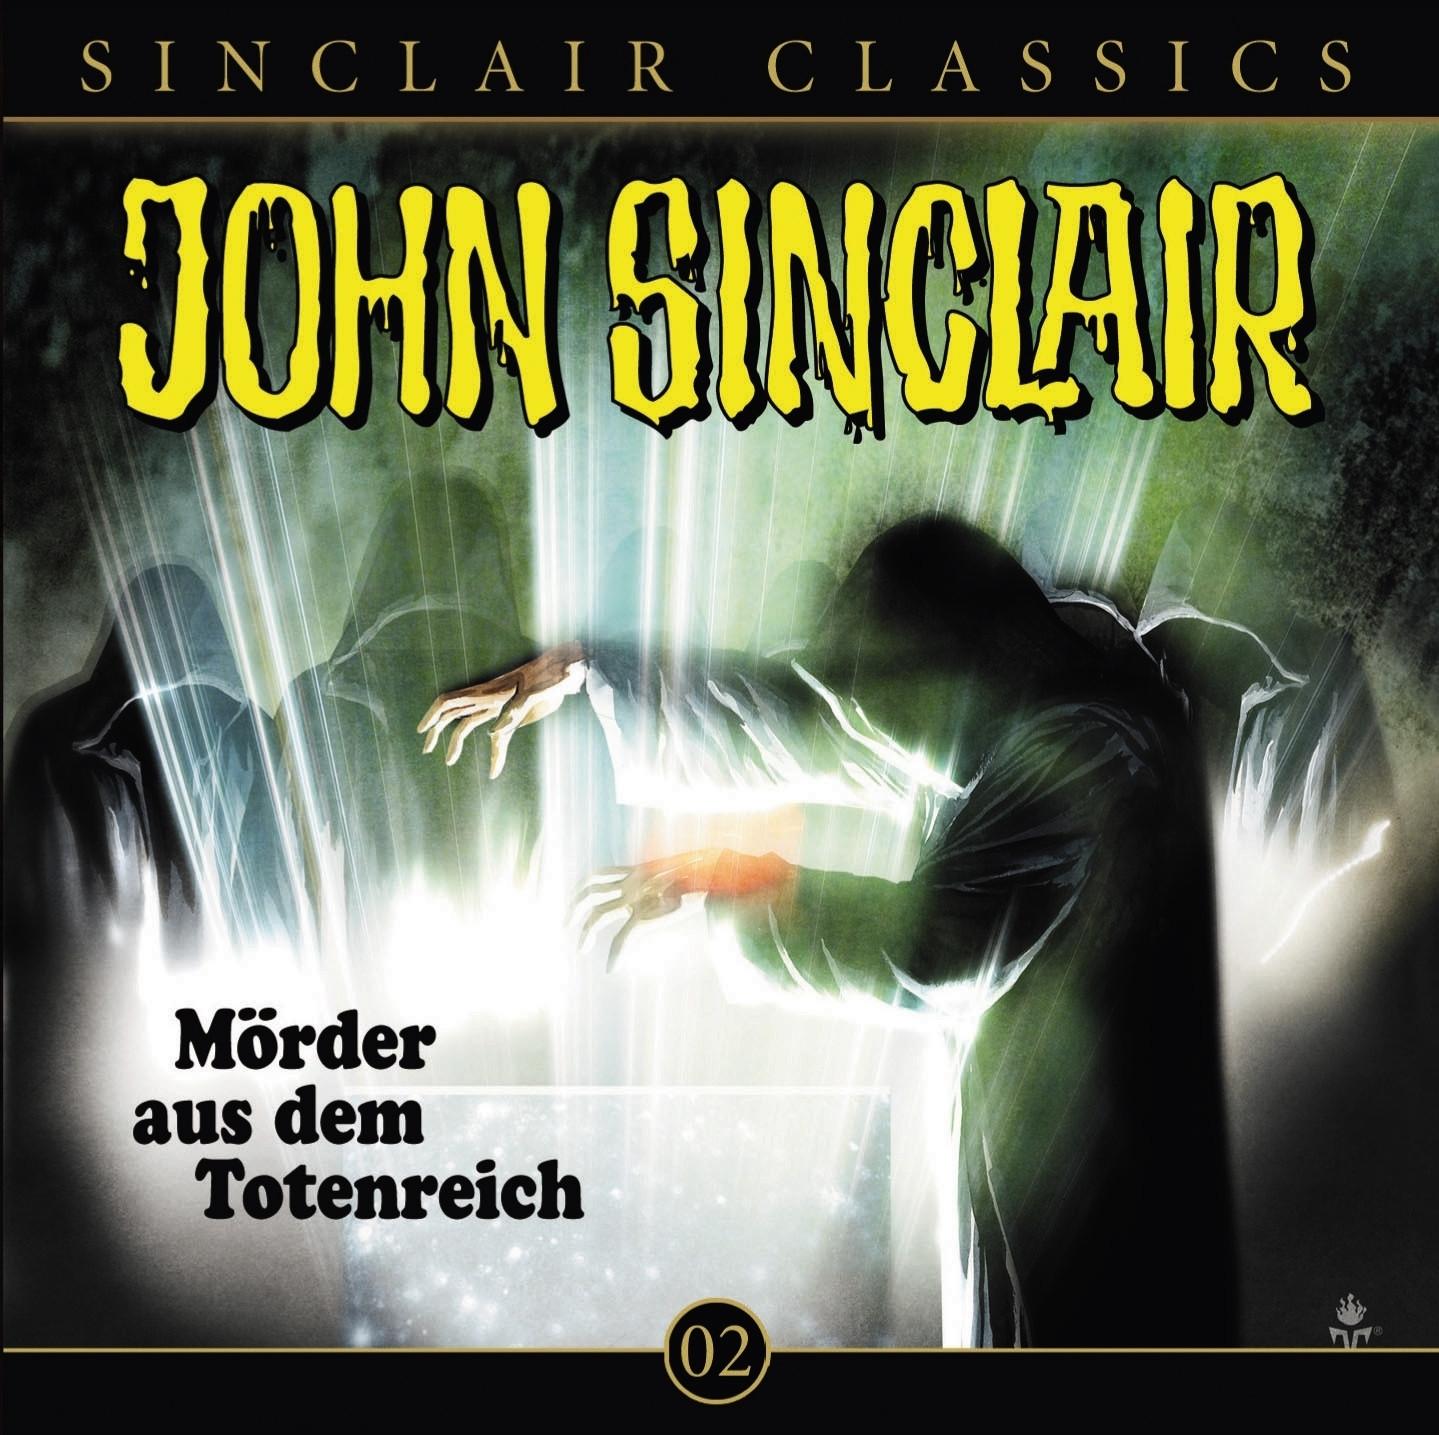 John Sinclair Classics 02 Mörder aus dem Totenreich